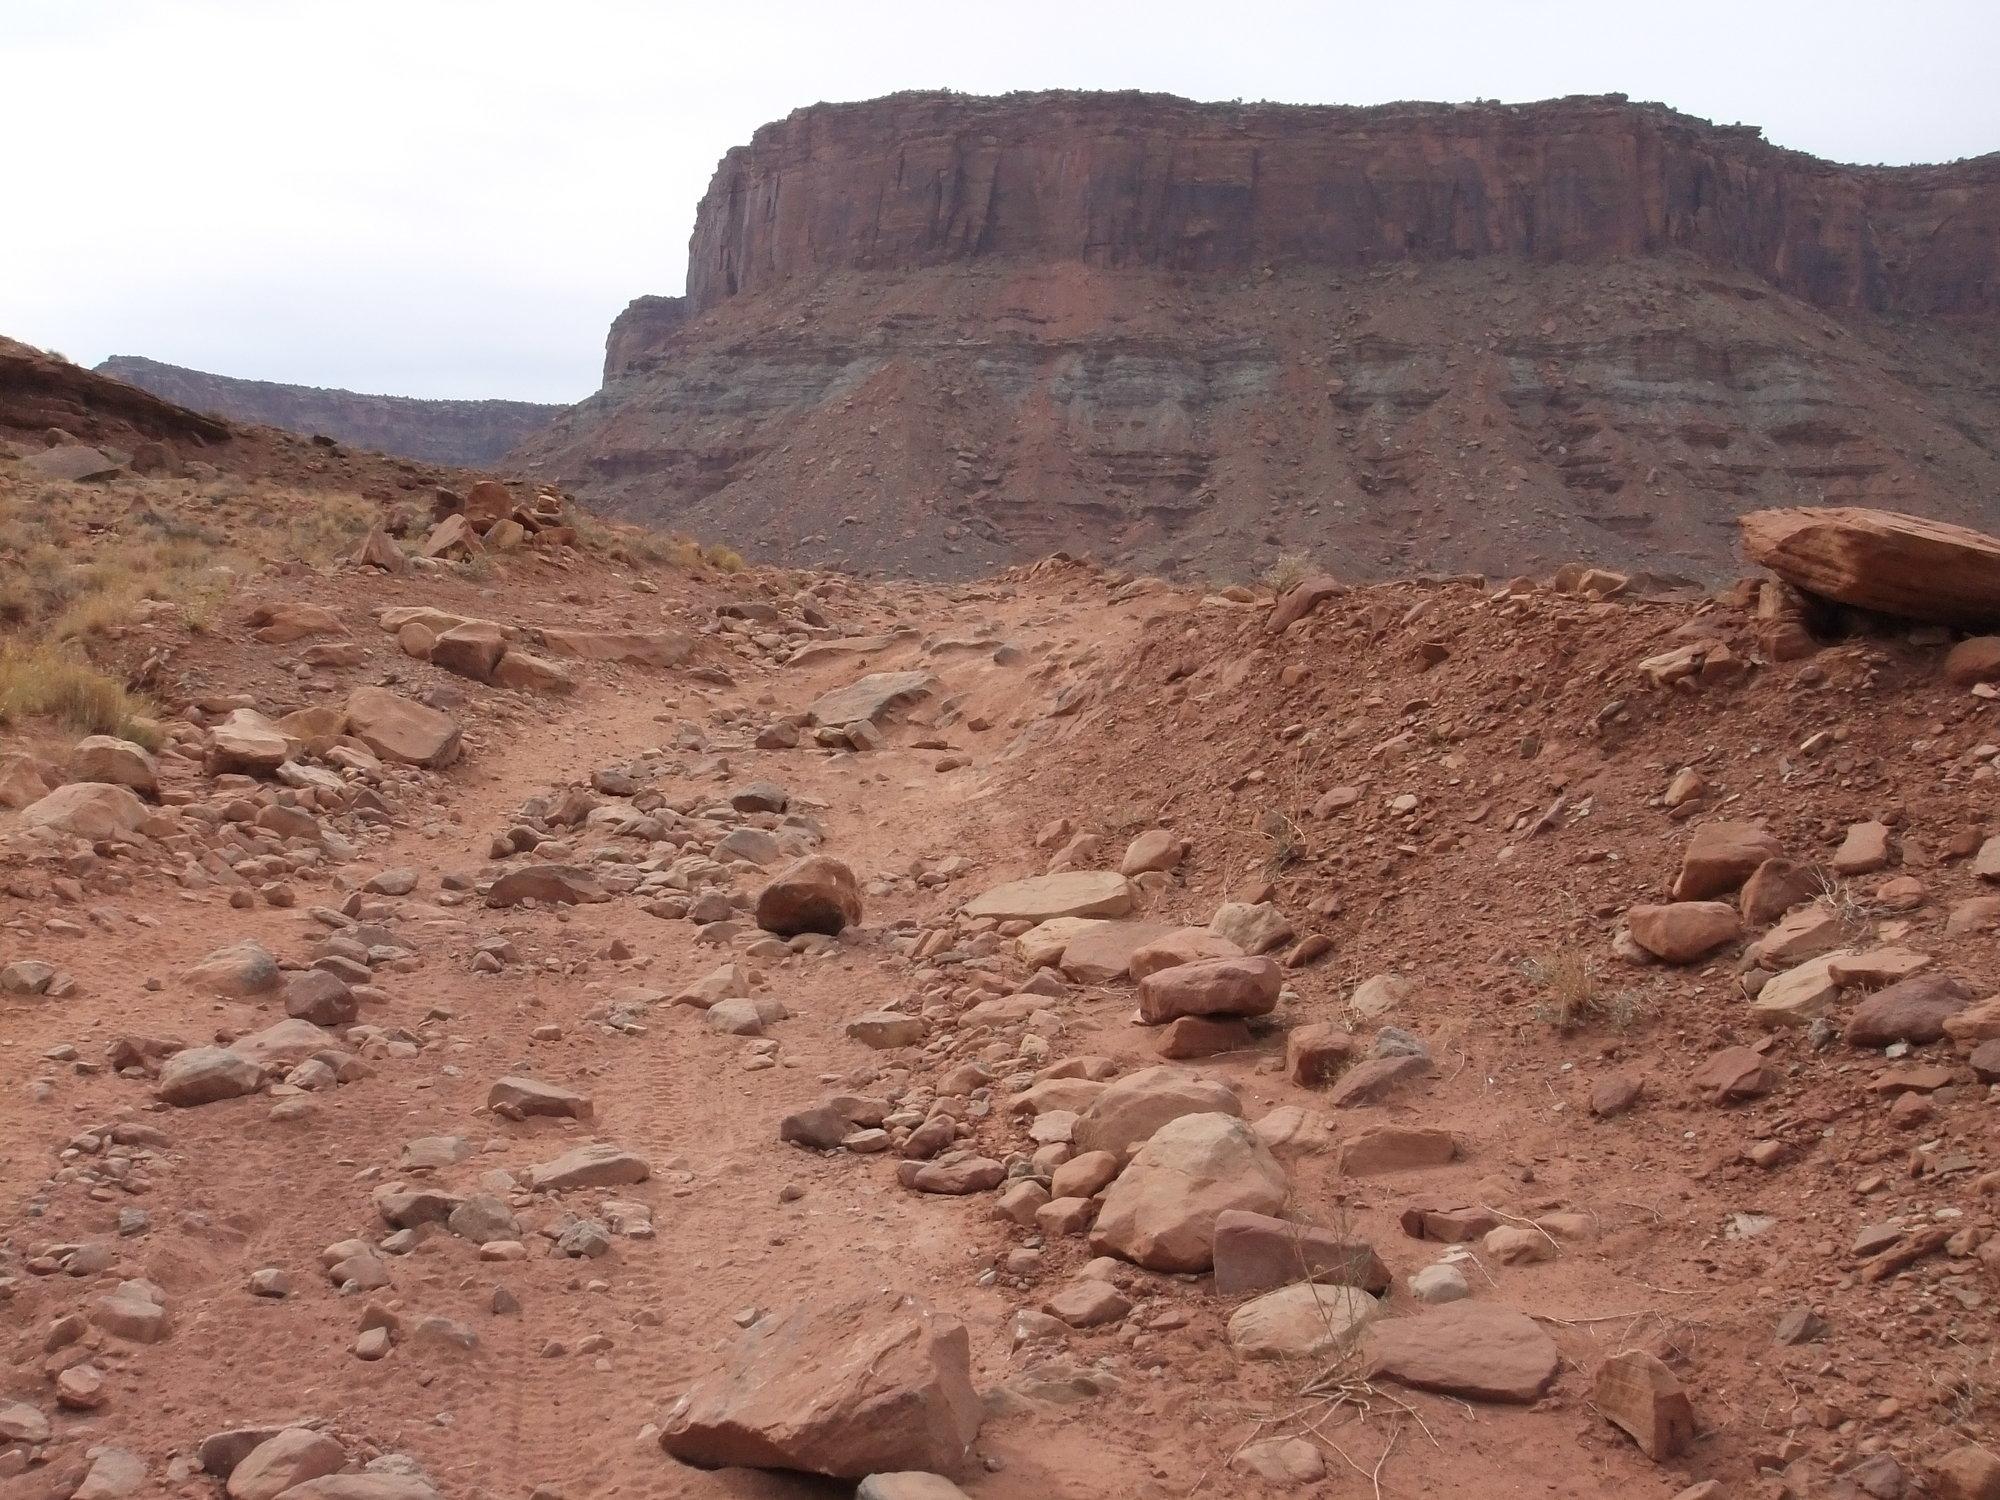 Moab Oct 2012 009.JPG